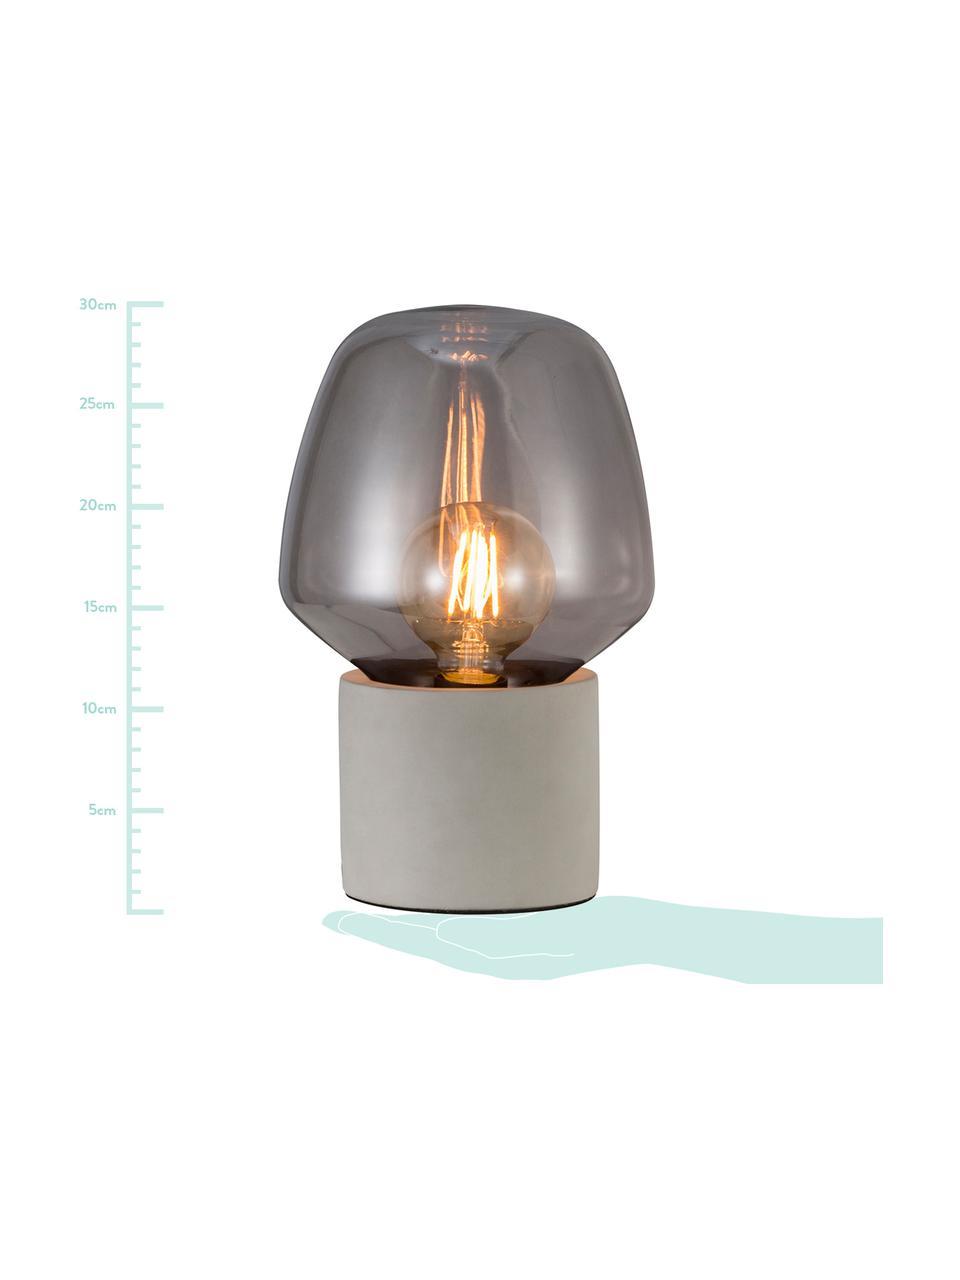 Kleine tafellamp Christina met betonnen voet, Lampenkap: glas, Lampvoet: betonkleurig, Betongrijs, grijs, transparant, Ø 20 x H 30 cm